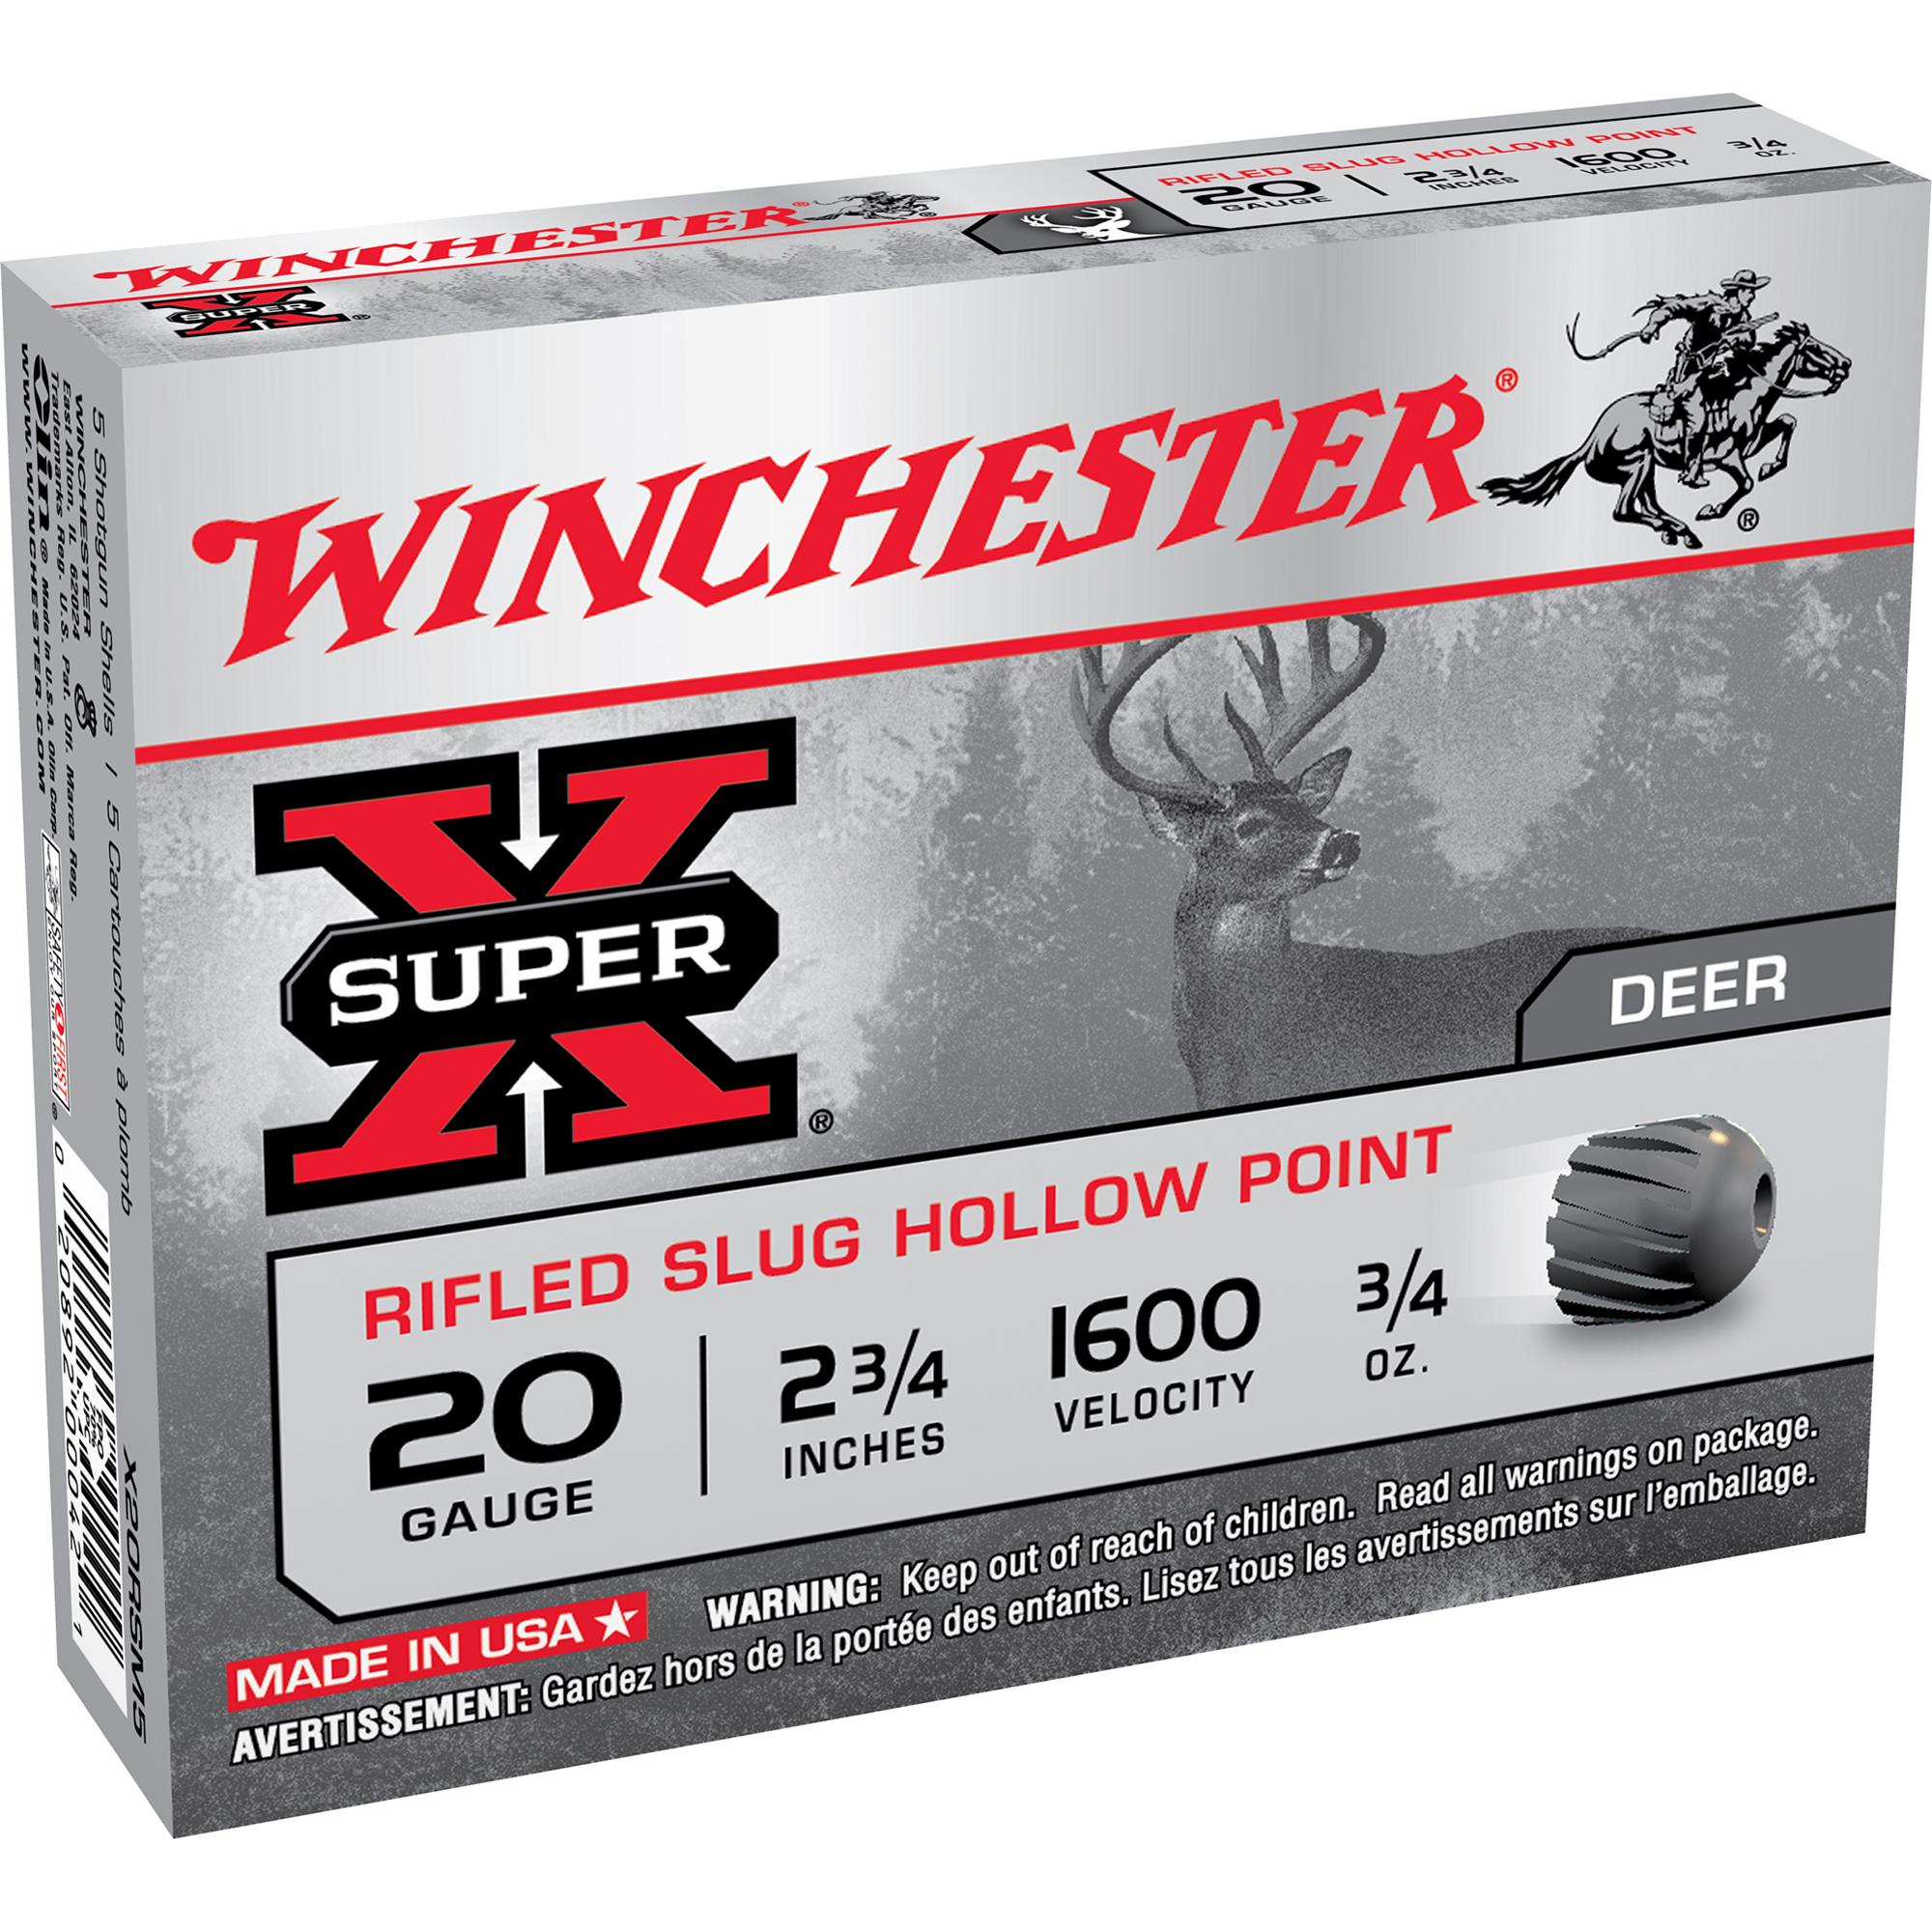 Winchester Super-X Rifled Slug Shotshells, 20-ga, 2-3/4″, 3/4-oz.